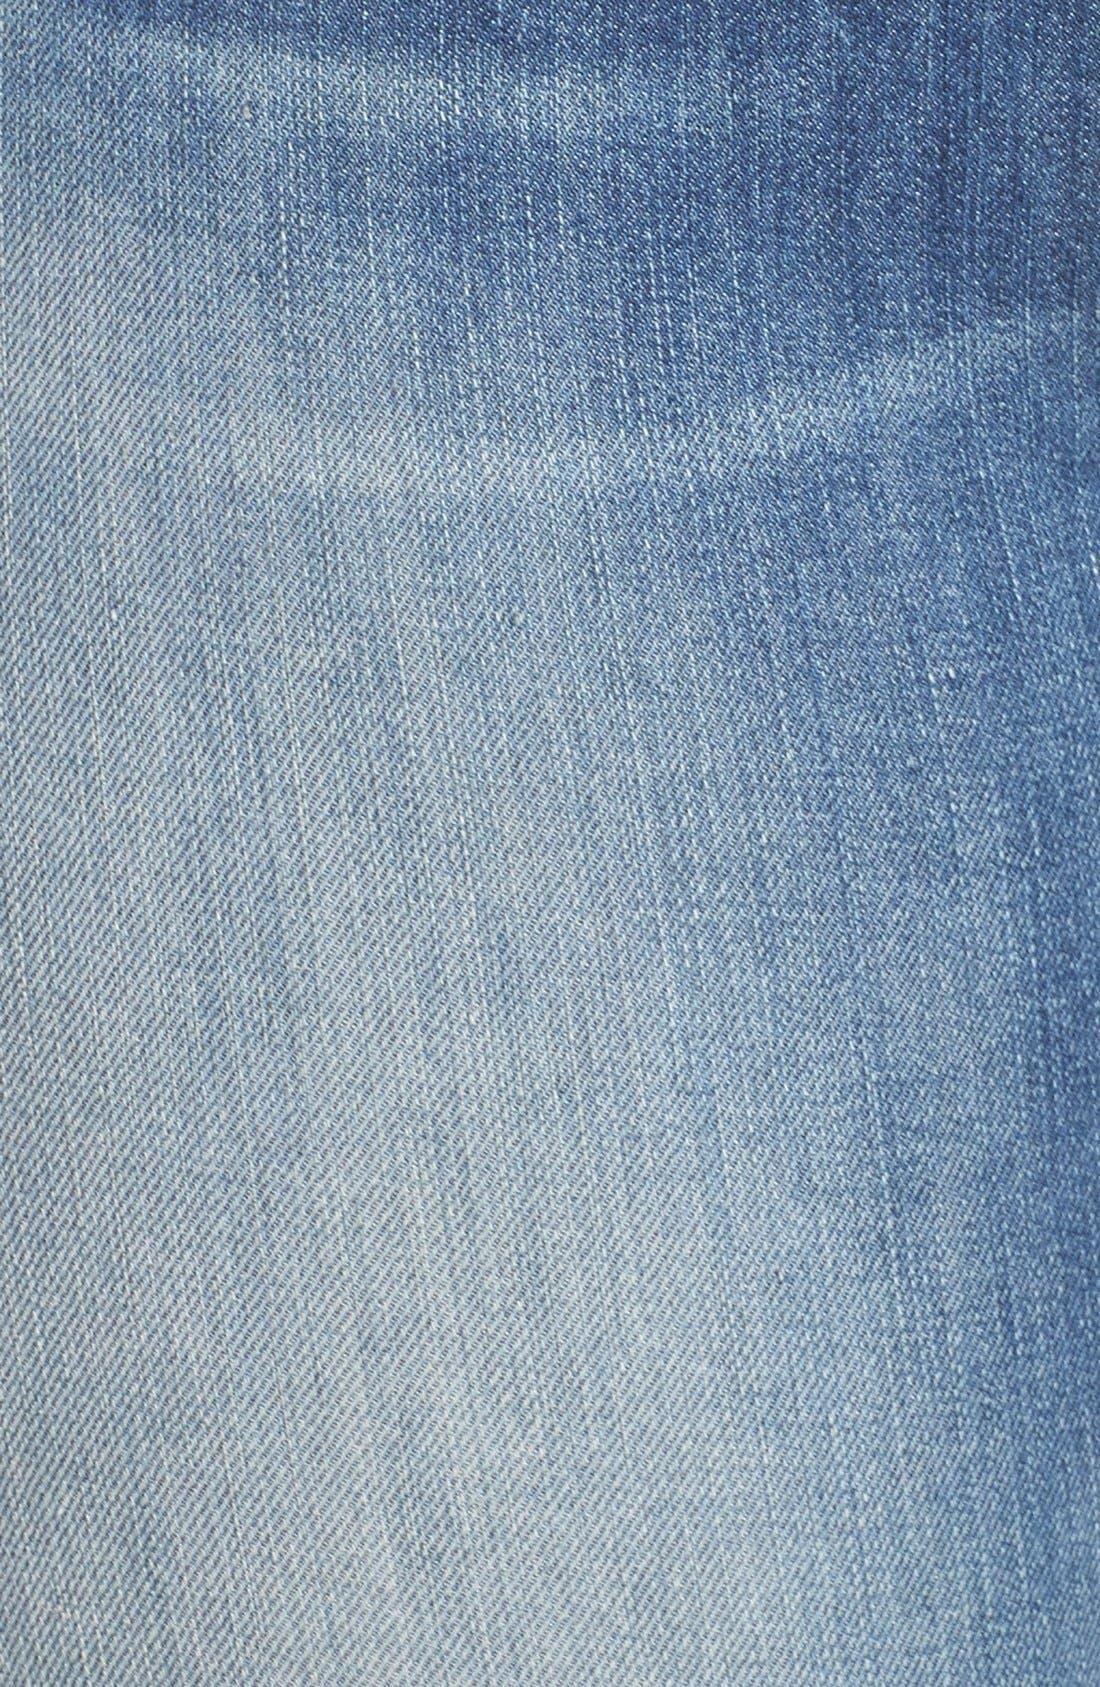 Alternate Image 7  - Good American Good Legs High Rise Crop Skinny Jeans